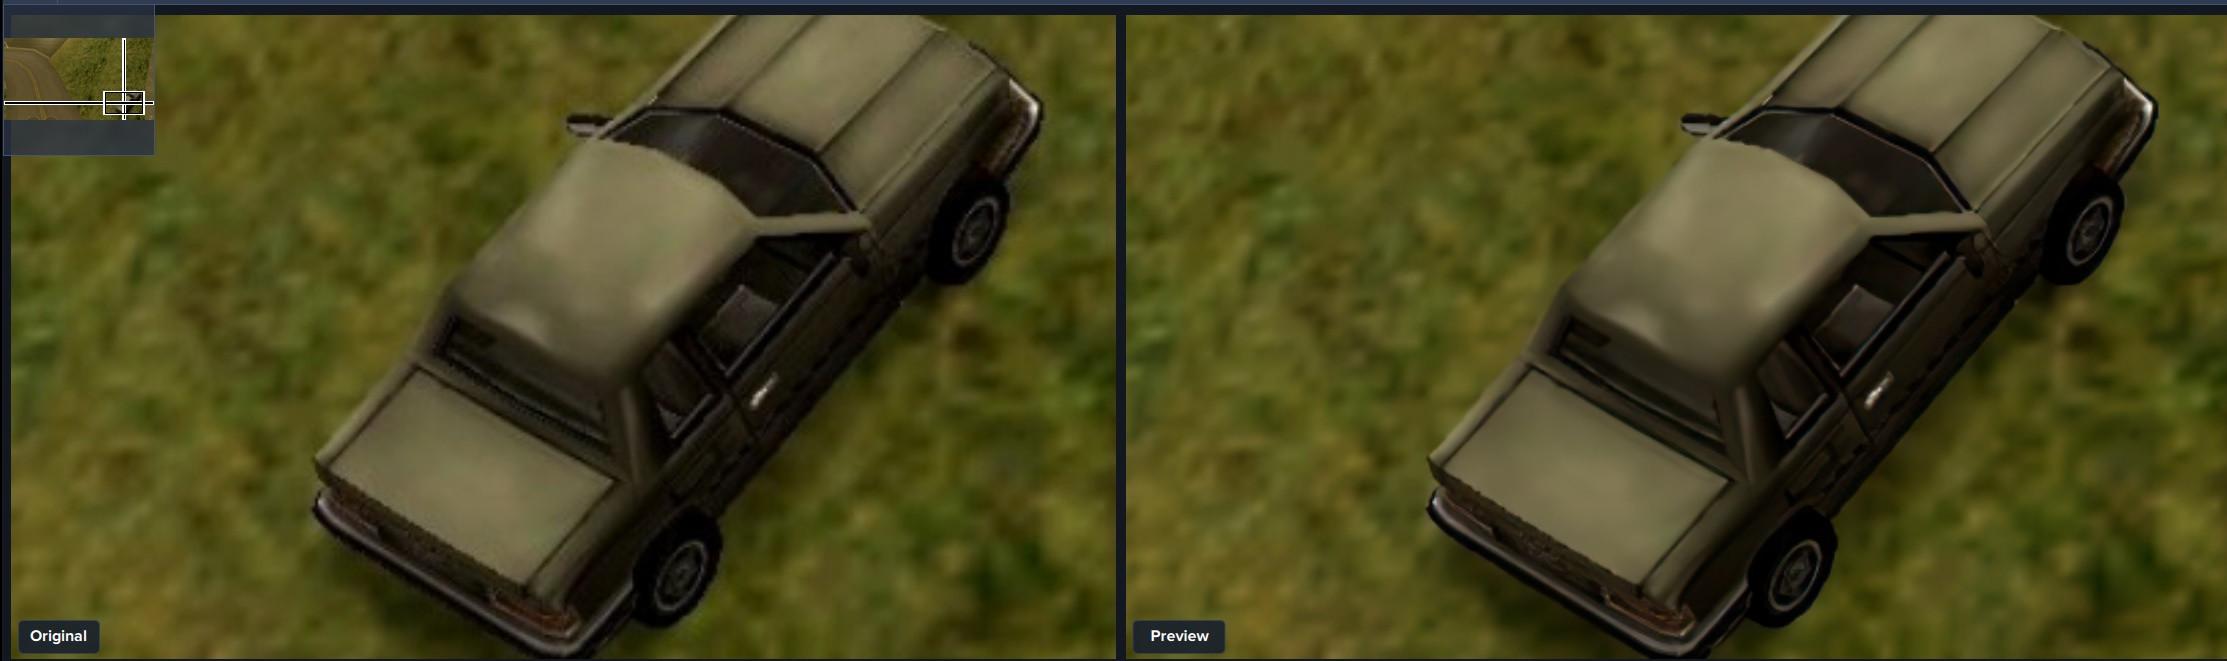 giga pixel AI